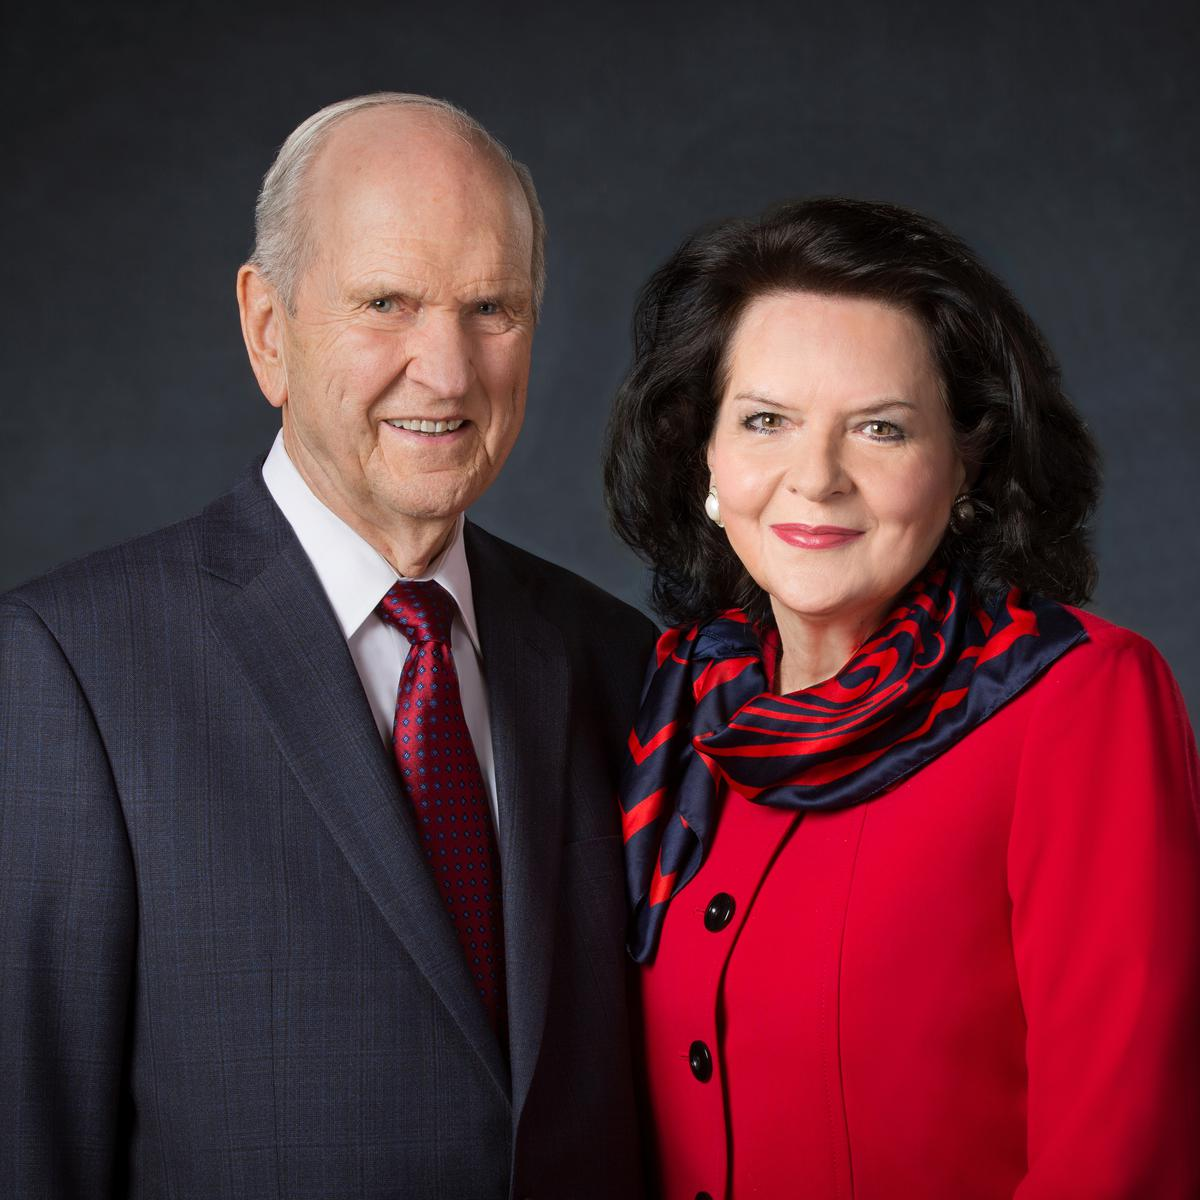 Presidente y hermana Nelson